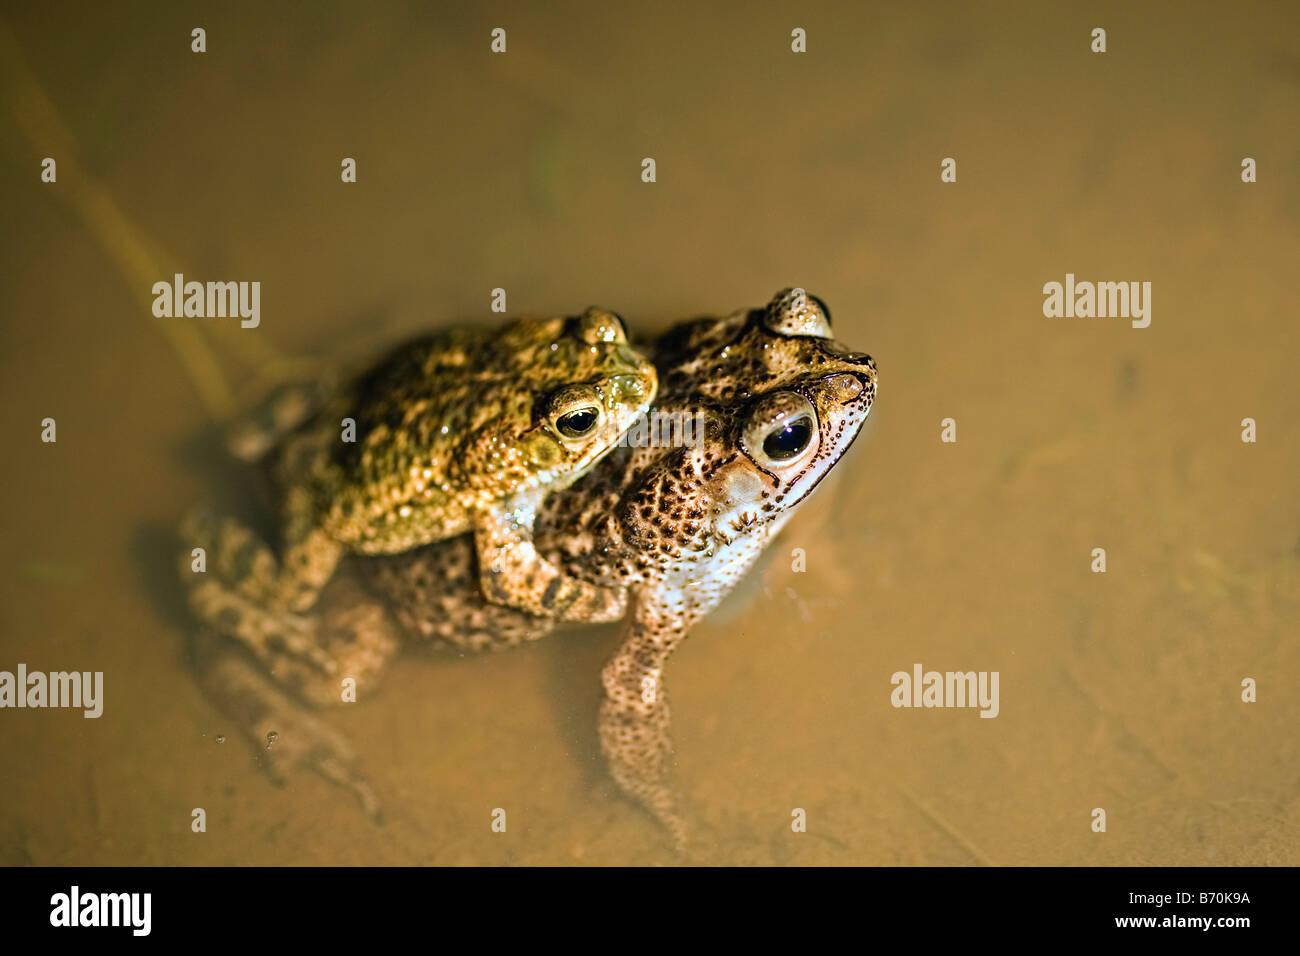 Suriname, Brownsweg, Brownsberg National Park. Pair of toads mating. - Stock Image